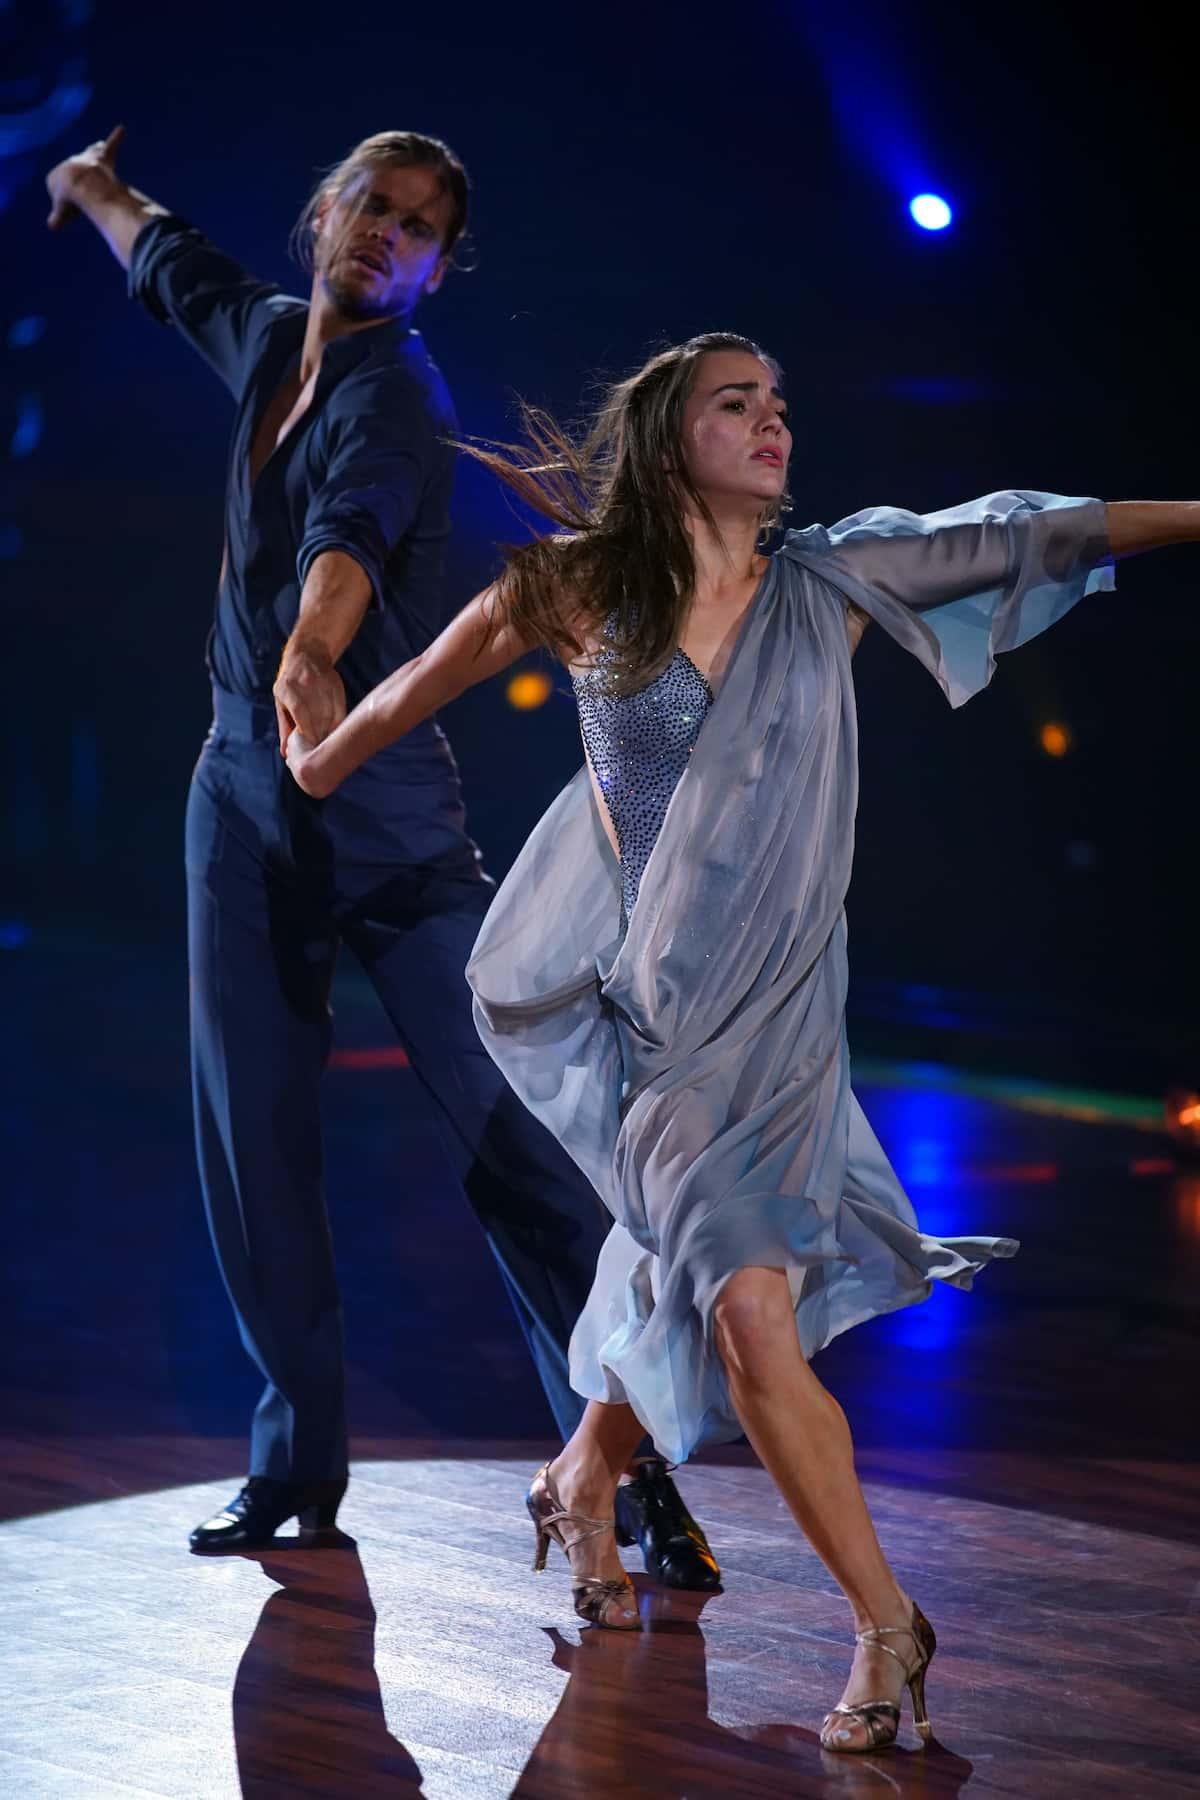 Rurik Gislason - Renata Lusin bei let's dance am 21.5.2021